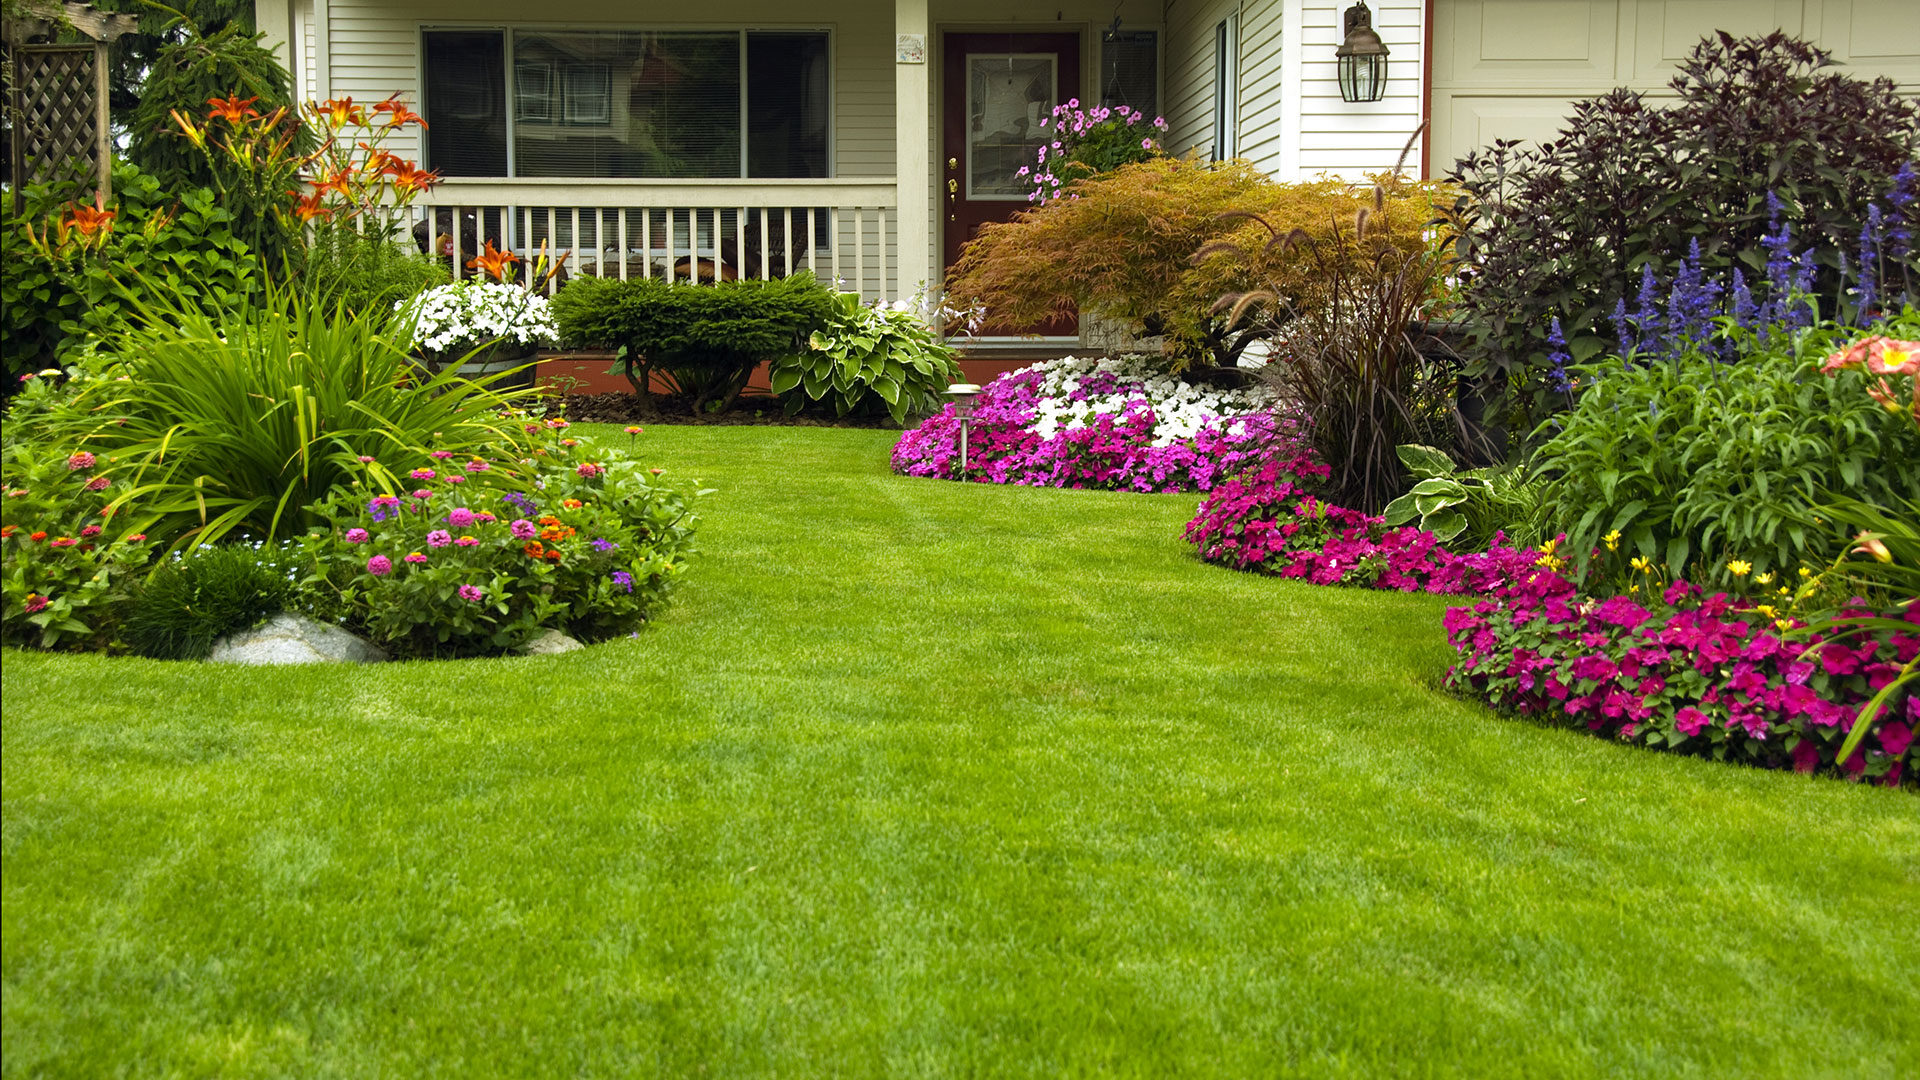 картинки газон с цветами месяц лета